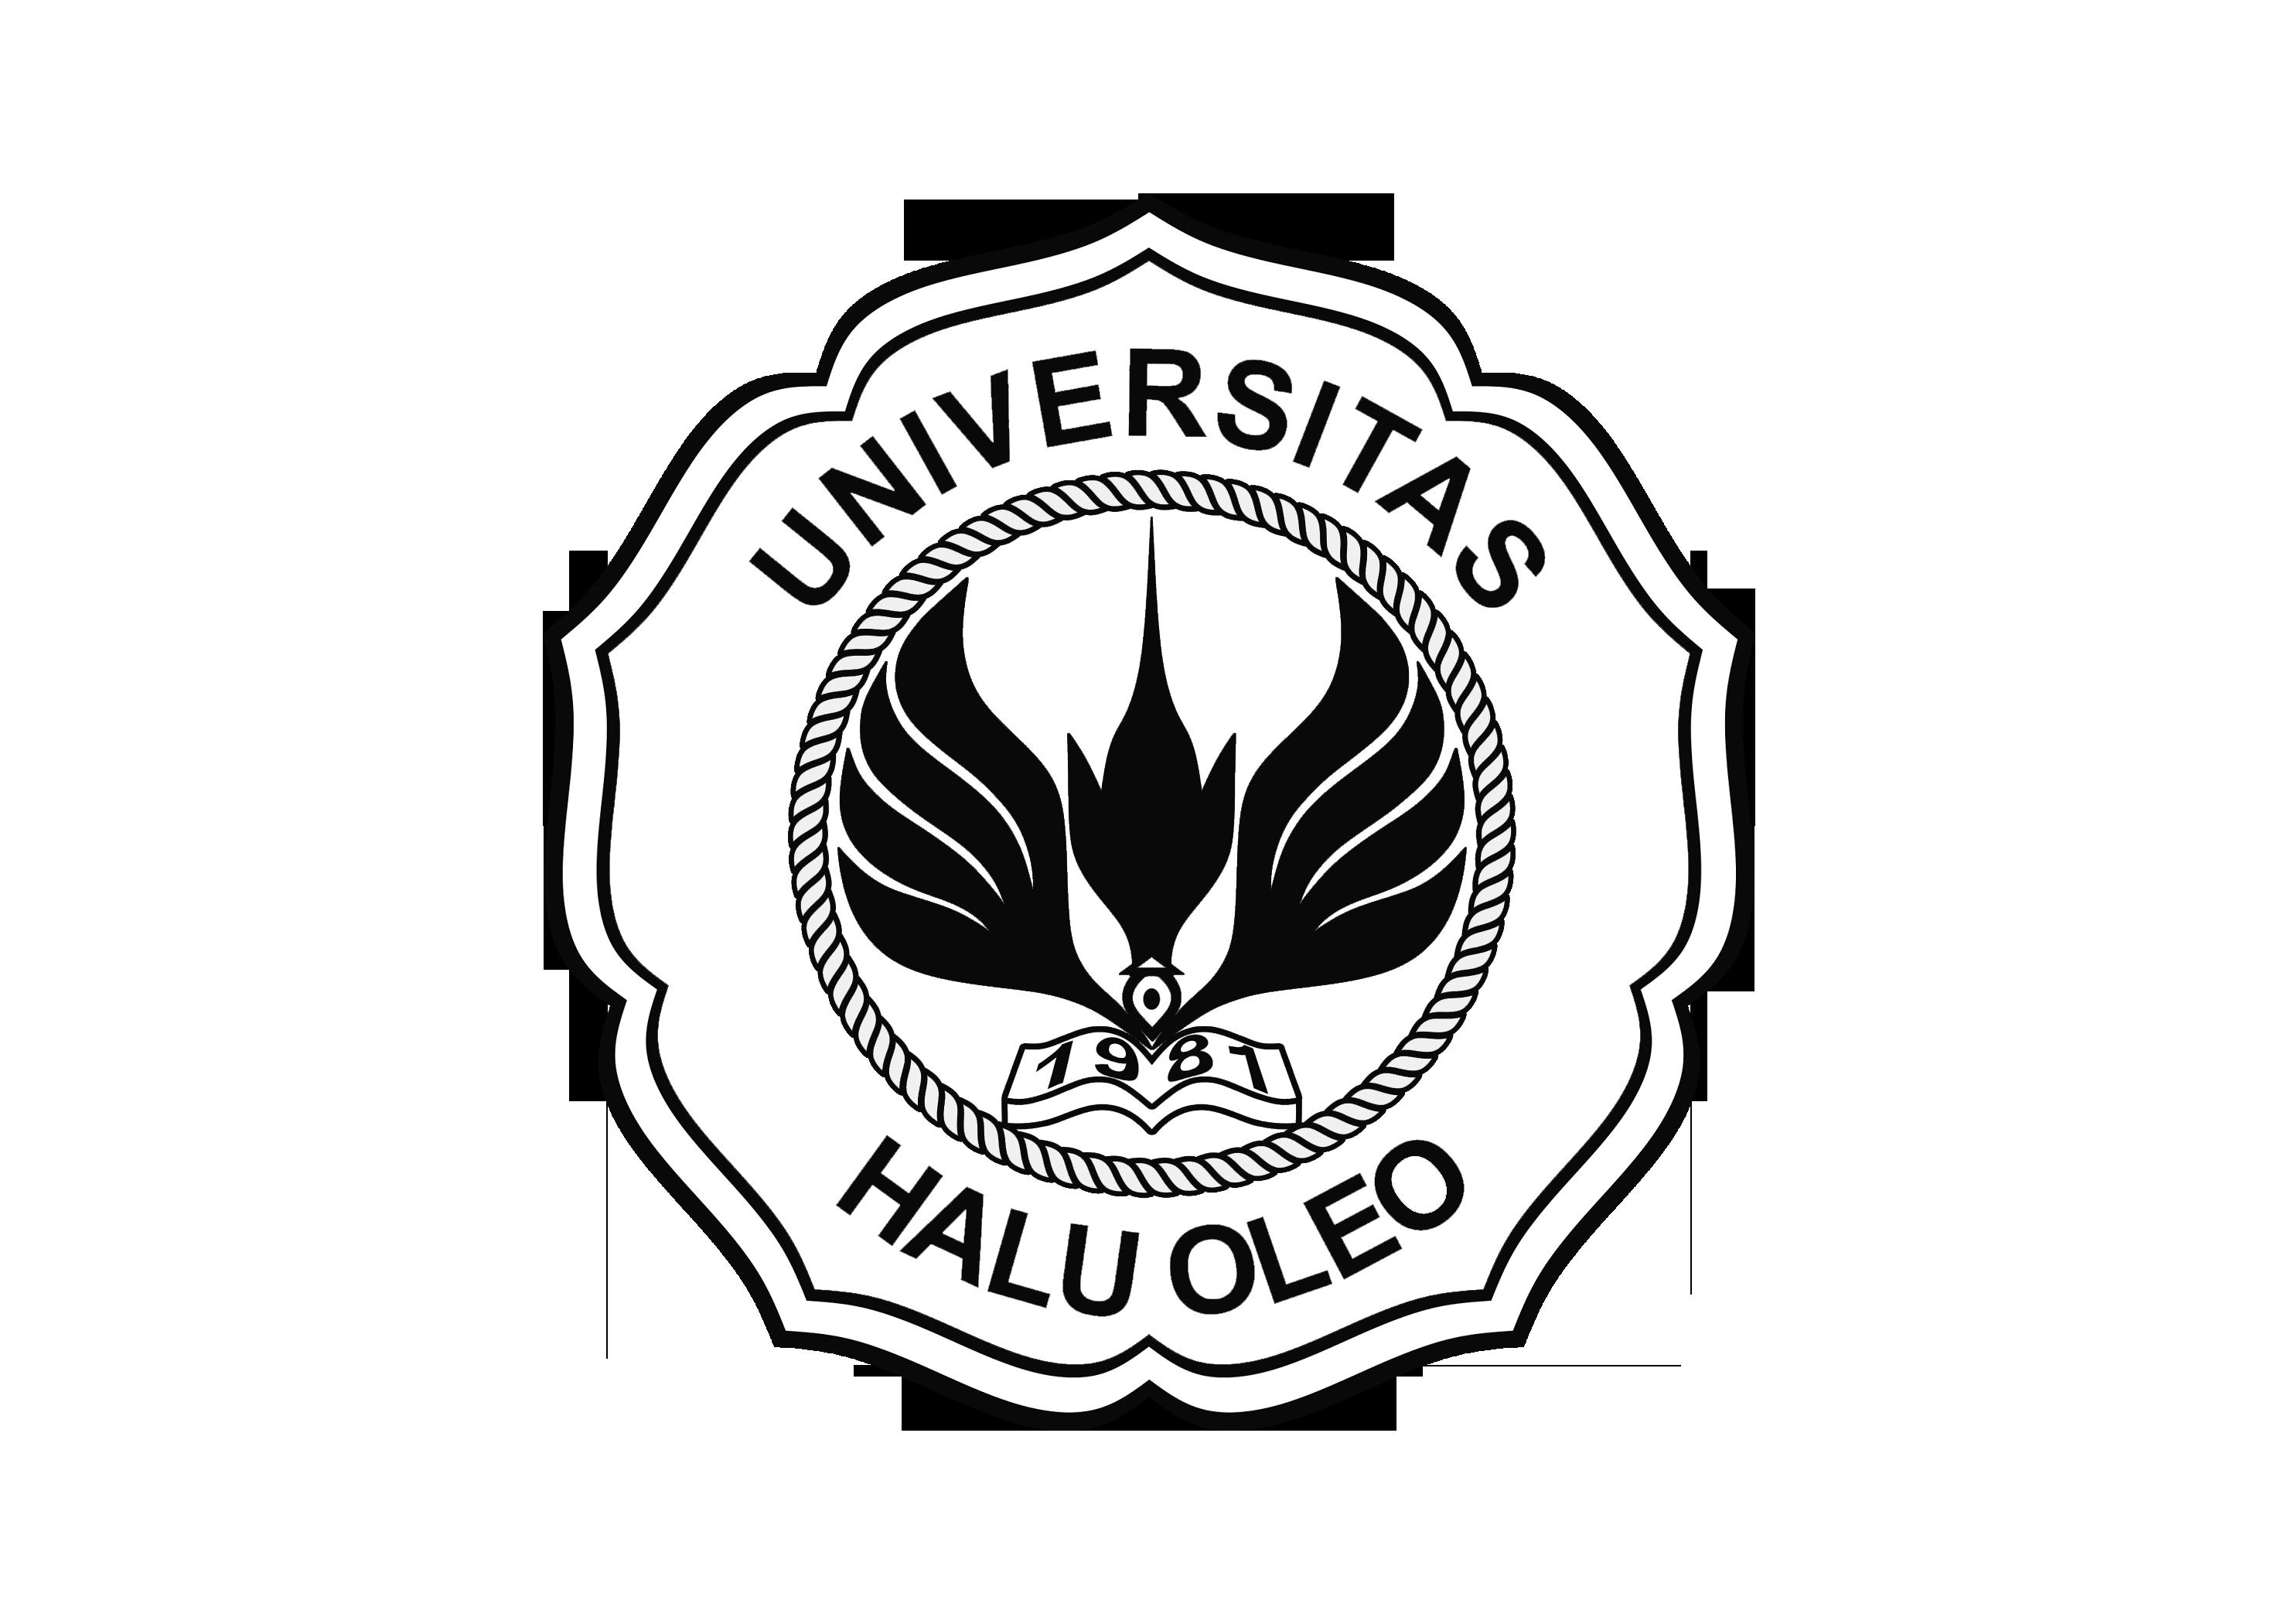 Logo UHO (Universitas Halu Oleo) Original PNG Hitam Putih